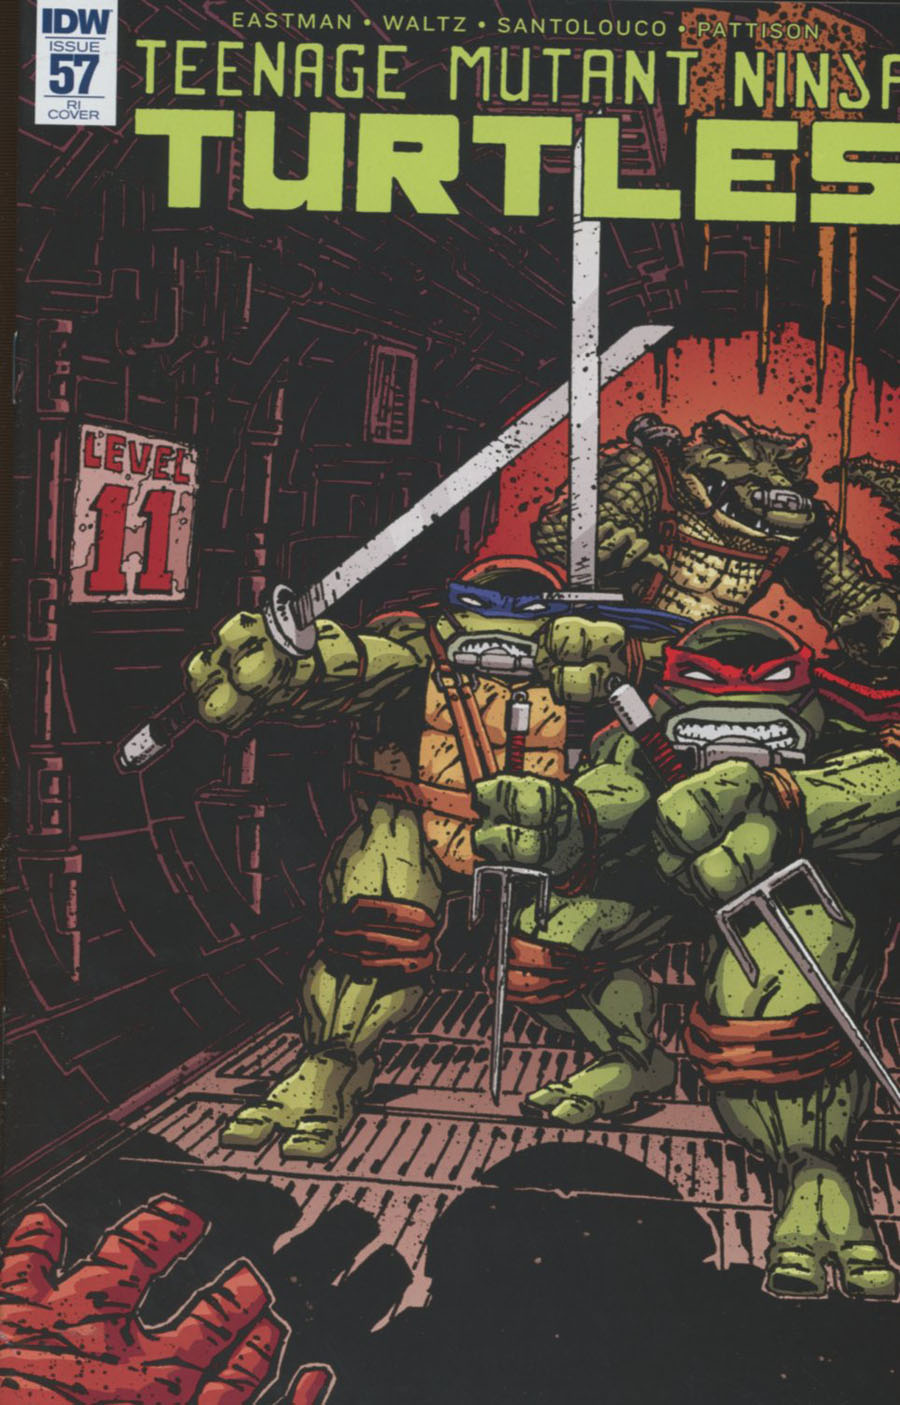 Teenage Mutant Ninja Turtles Vol 5 #57 Cover C Incentive Kevin Eastman Variant Cover